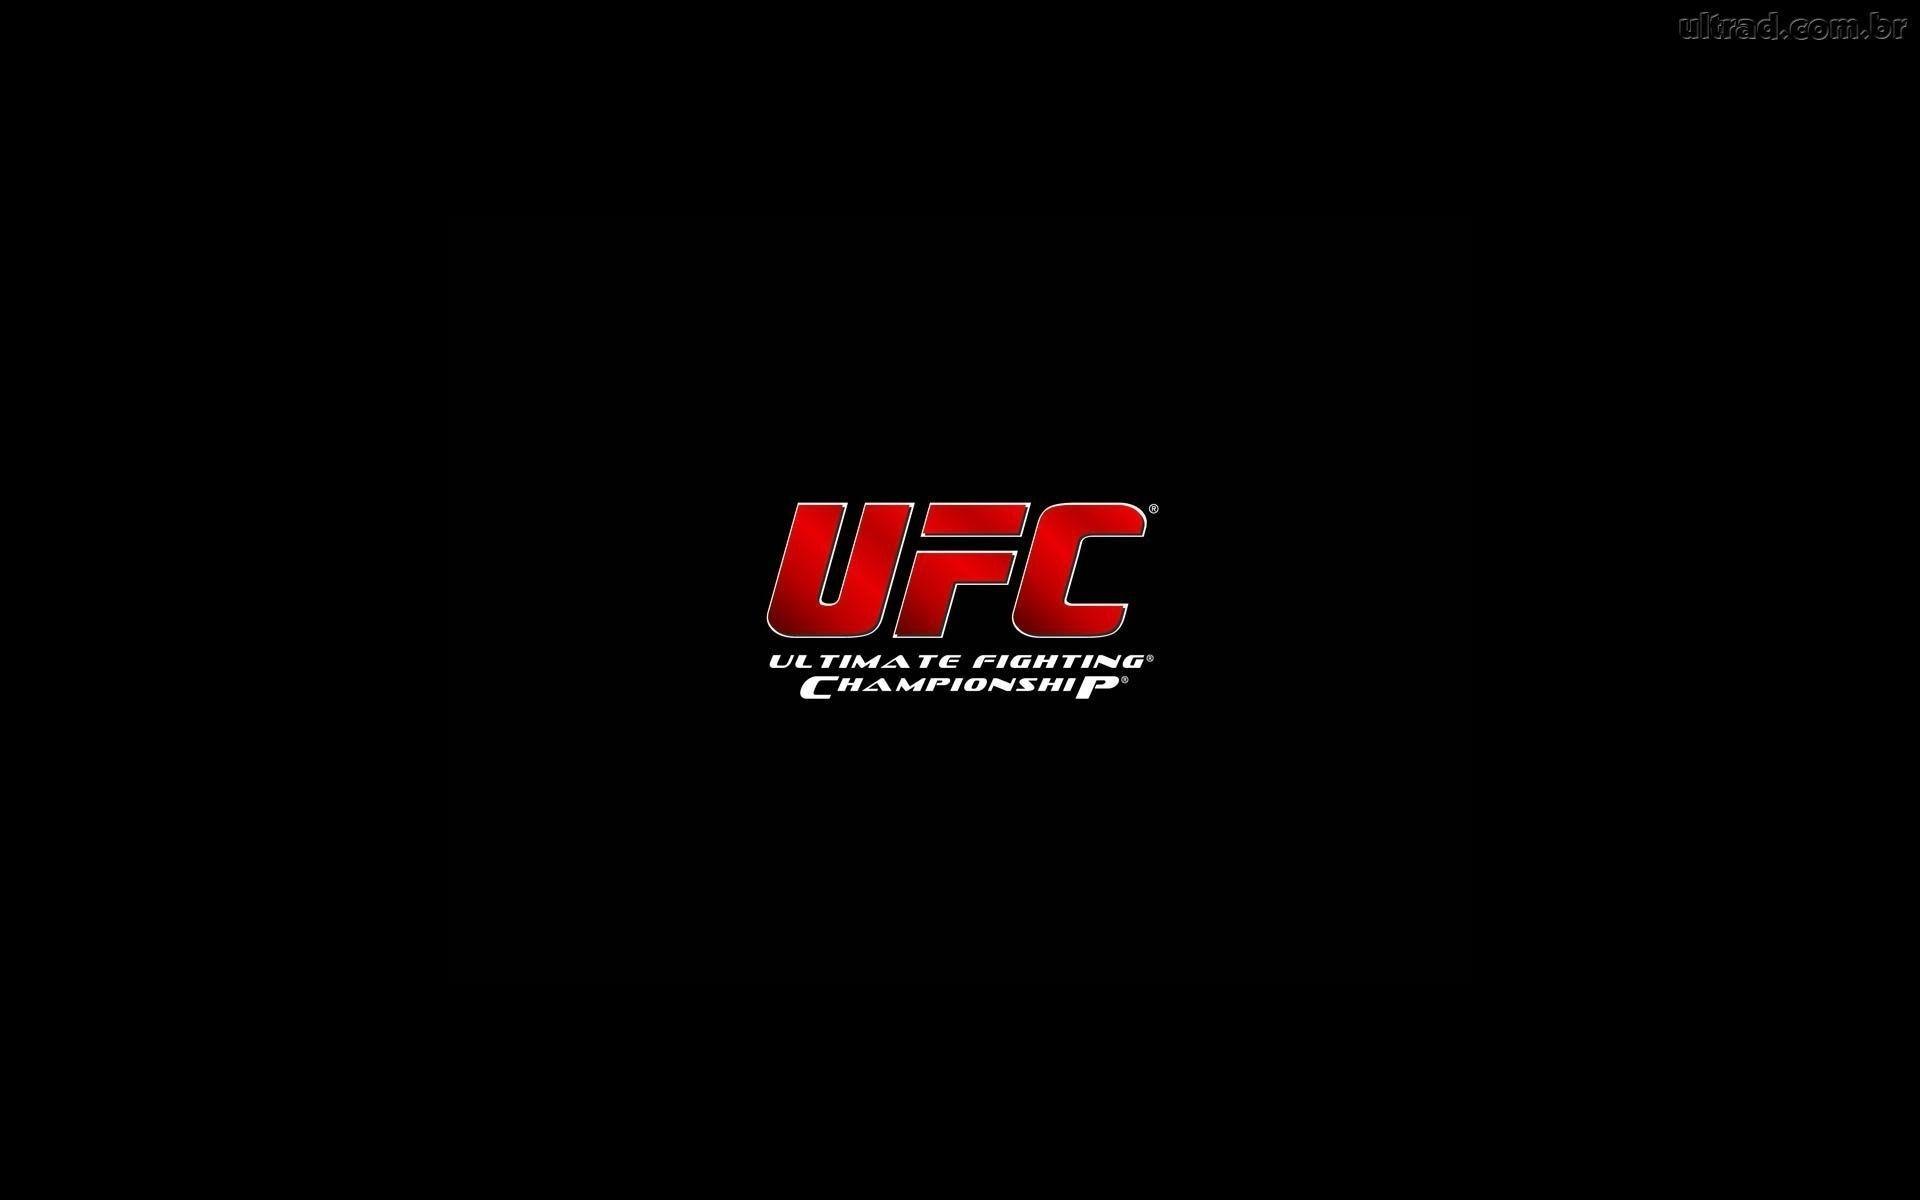 Ufc Logo Wallpaper 70 Pictures